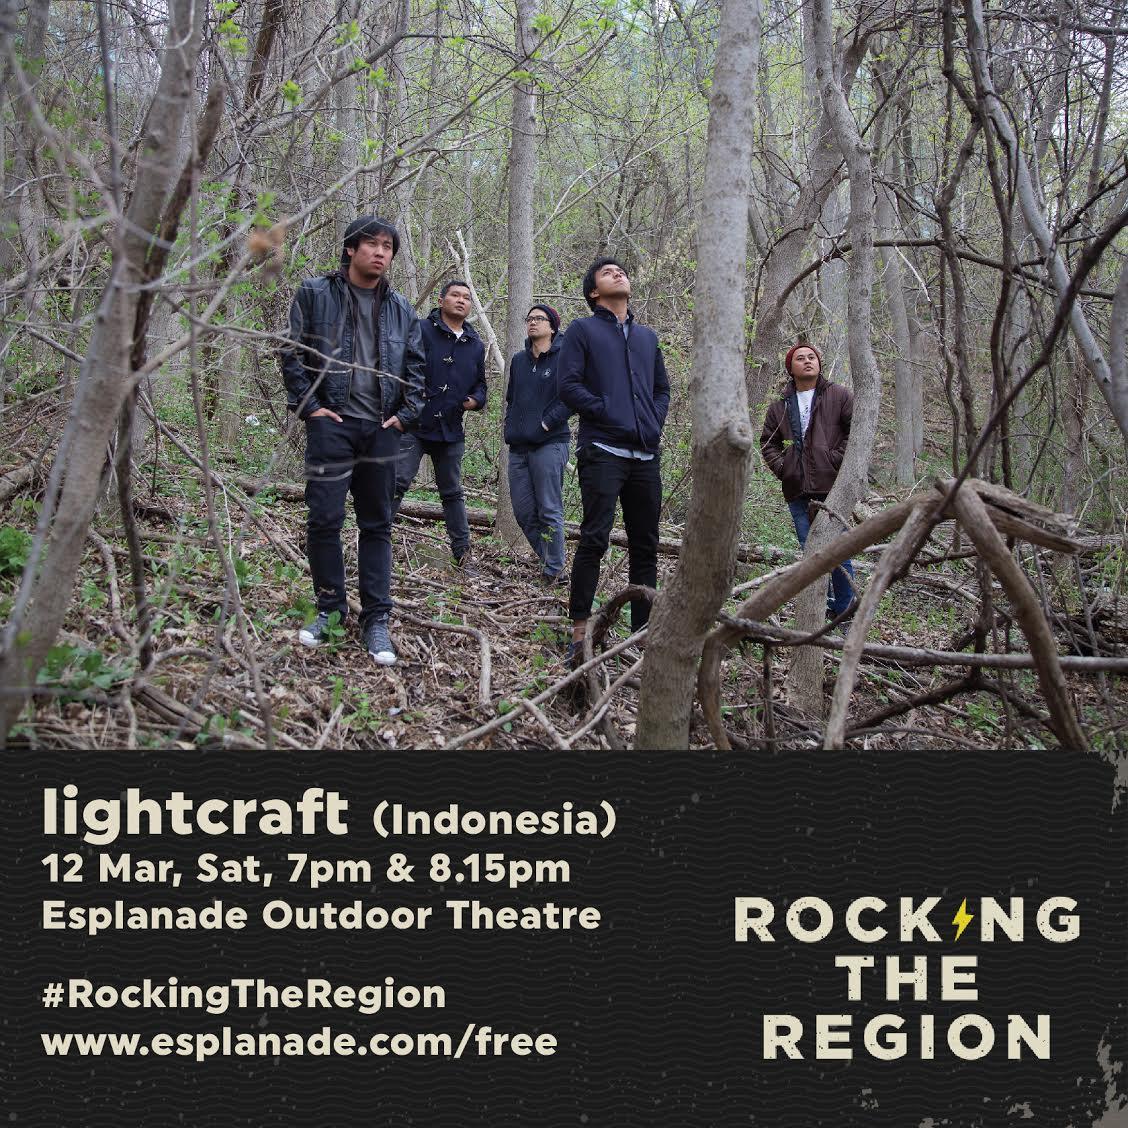 Lighcraft band Indonesia